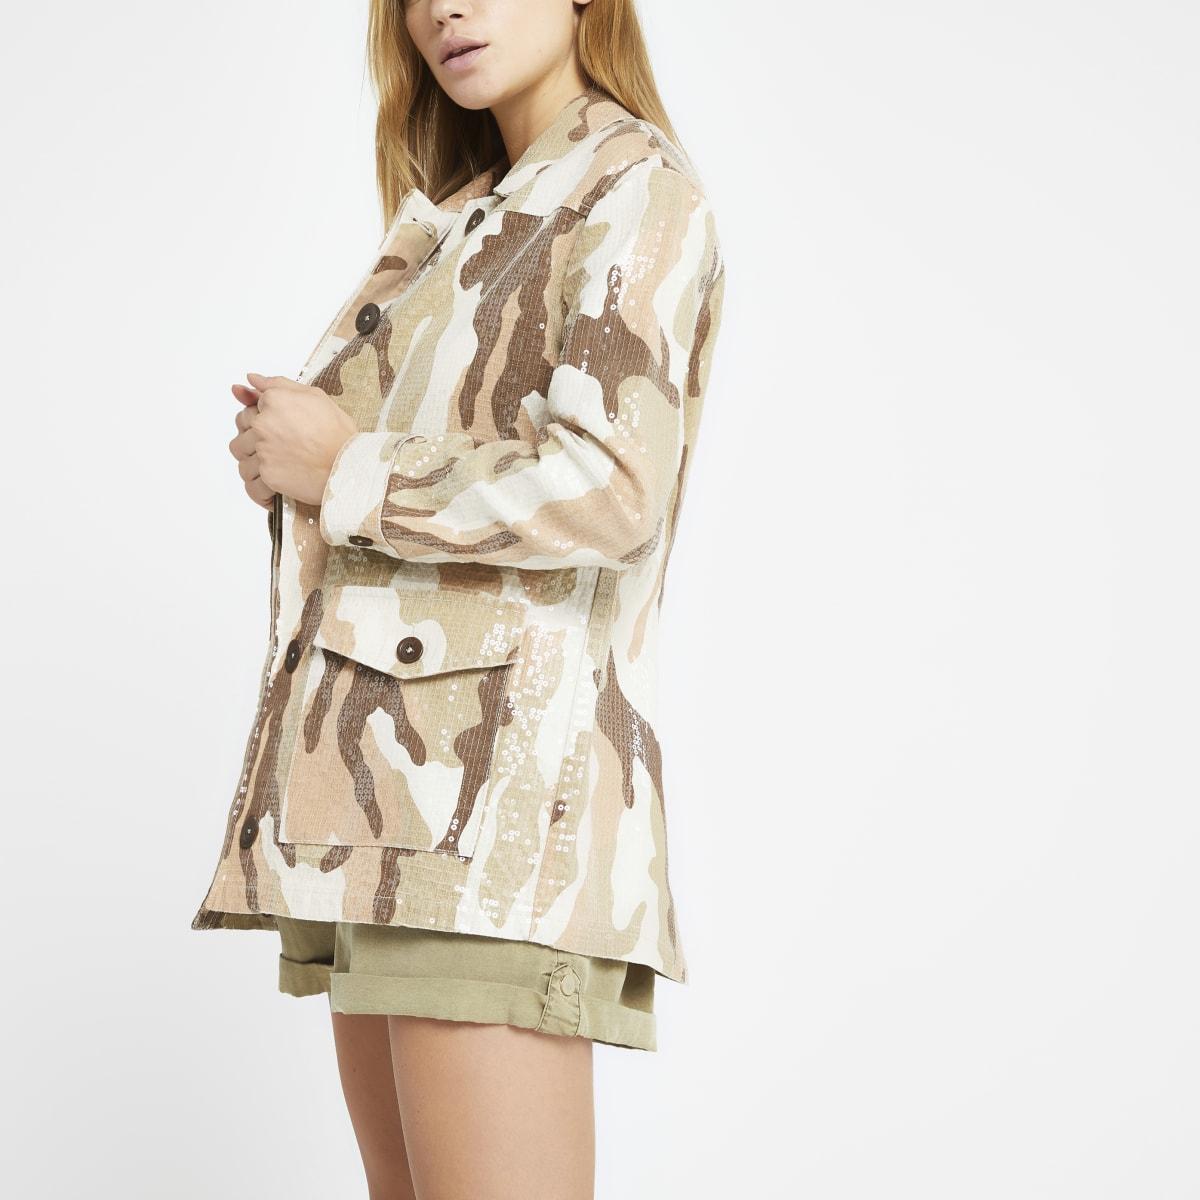 Crème legerjack met camouflageprint en pailletten